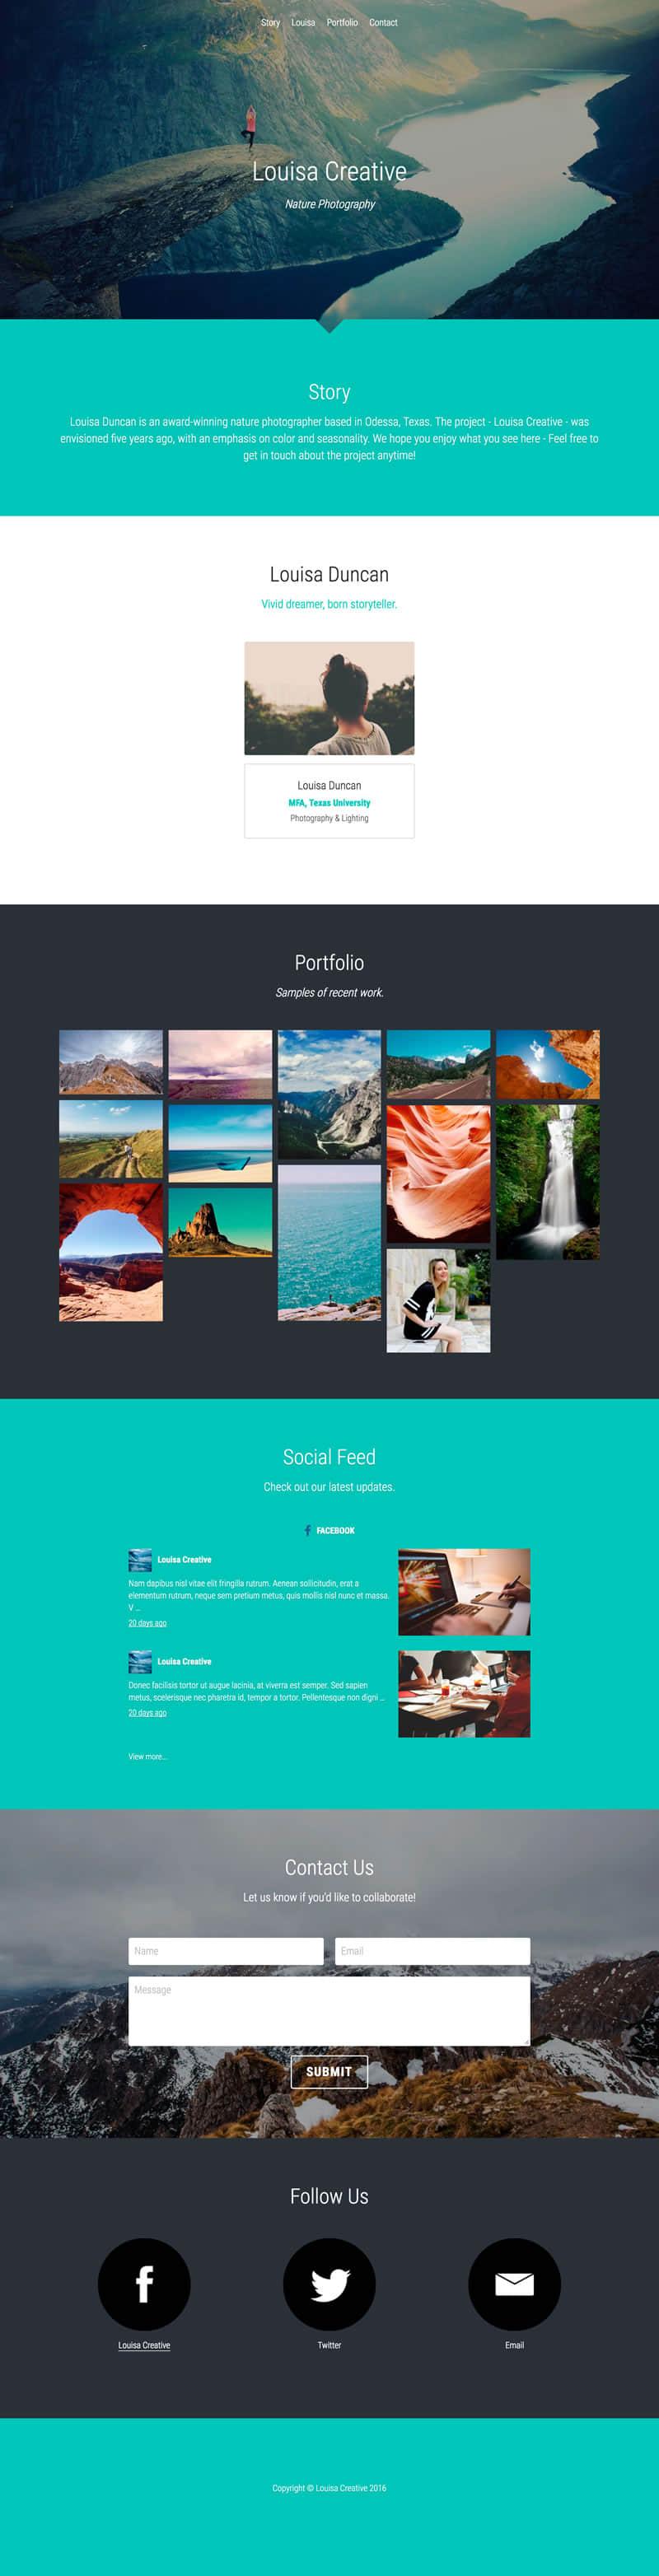 Monitor fb page